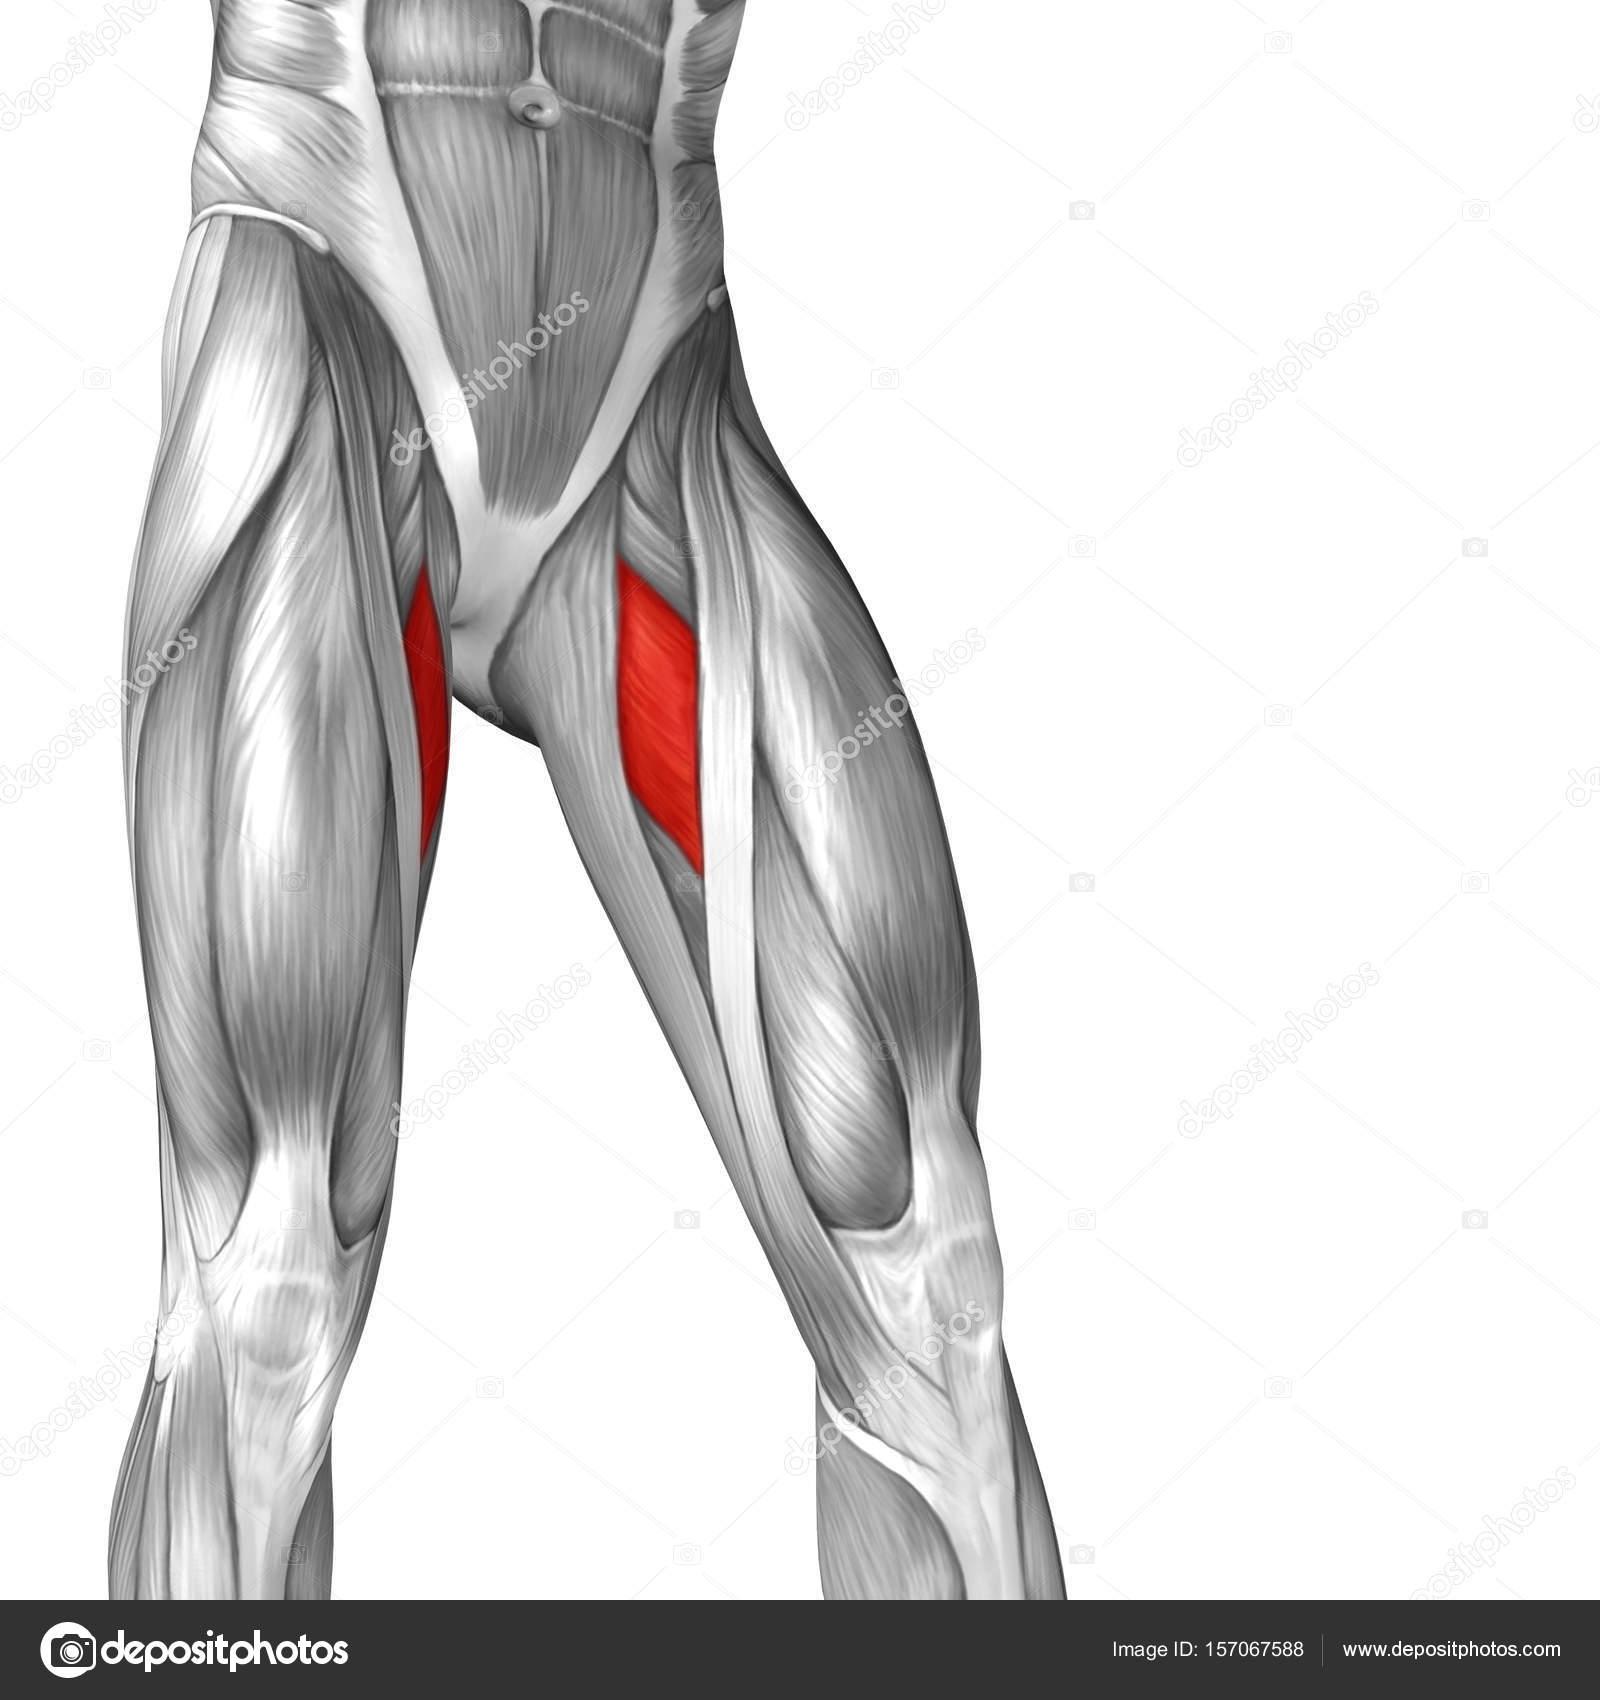 human upper legs anatomy — Stock Photo © design36 #157067588